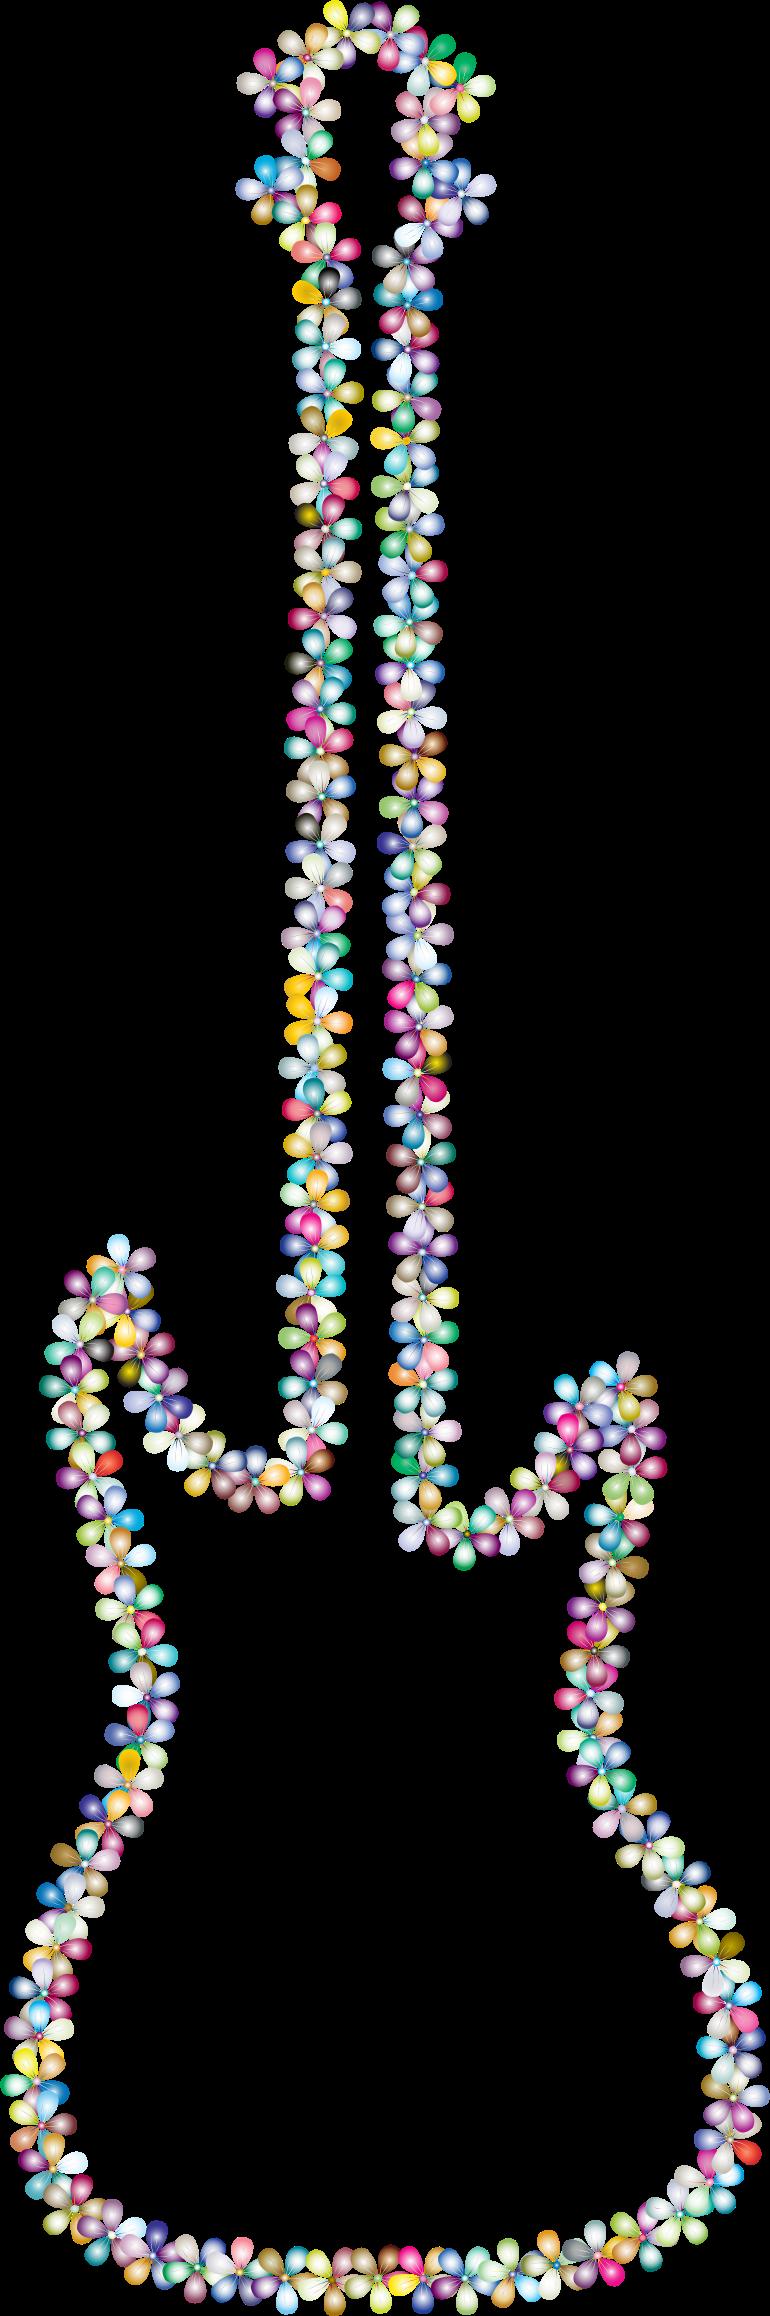 Prismatic outline big image. Clipart guitar floral